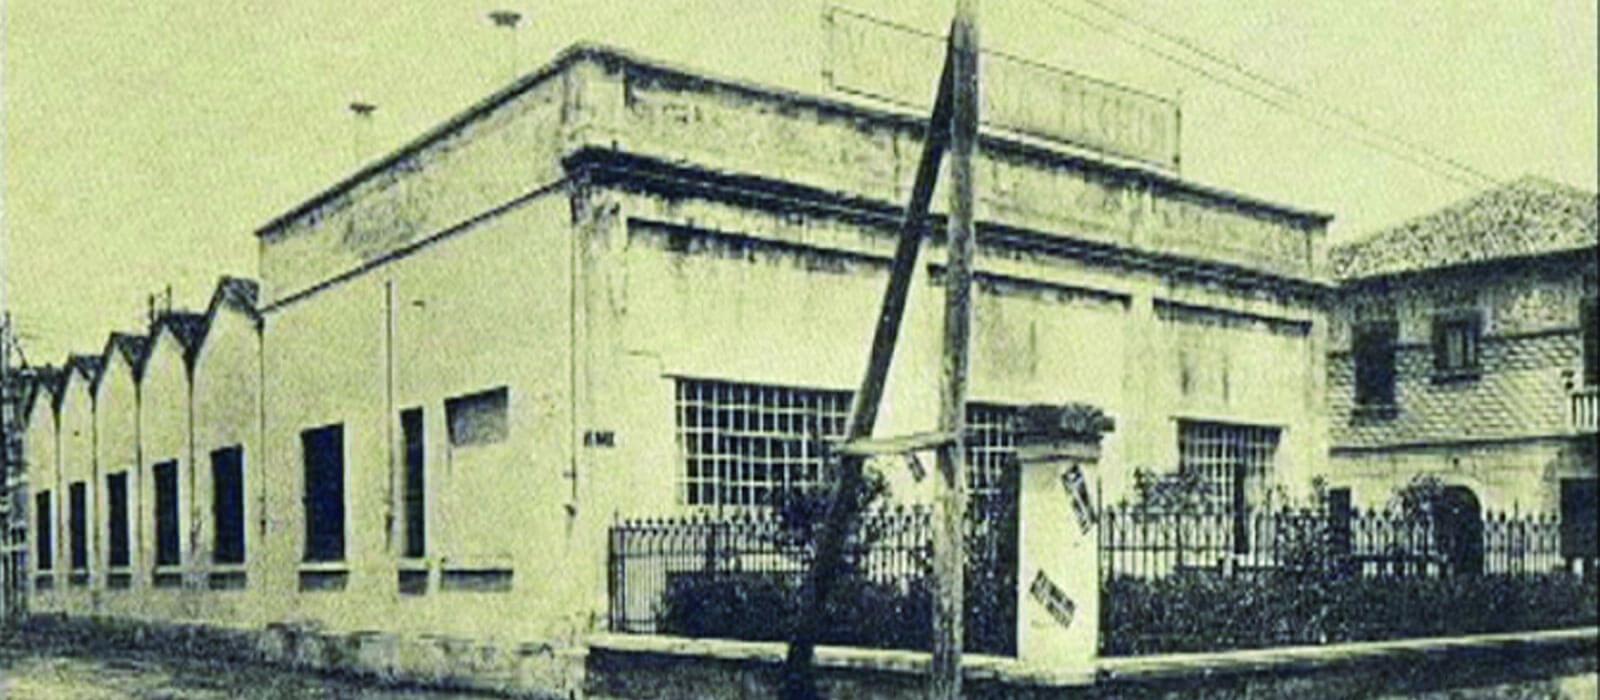 Wo Dipl. Ing. Giovanni Peghin startet. Standort und Fabrik Blowtherm Padova 1956